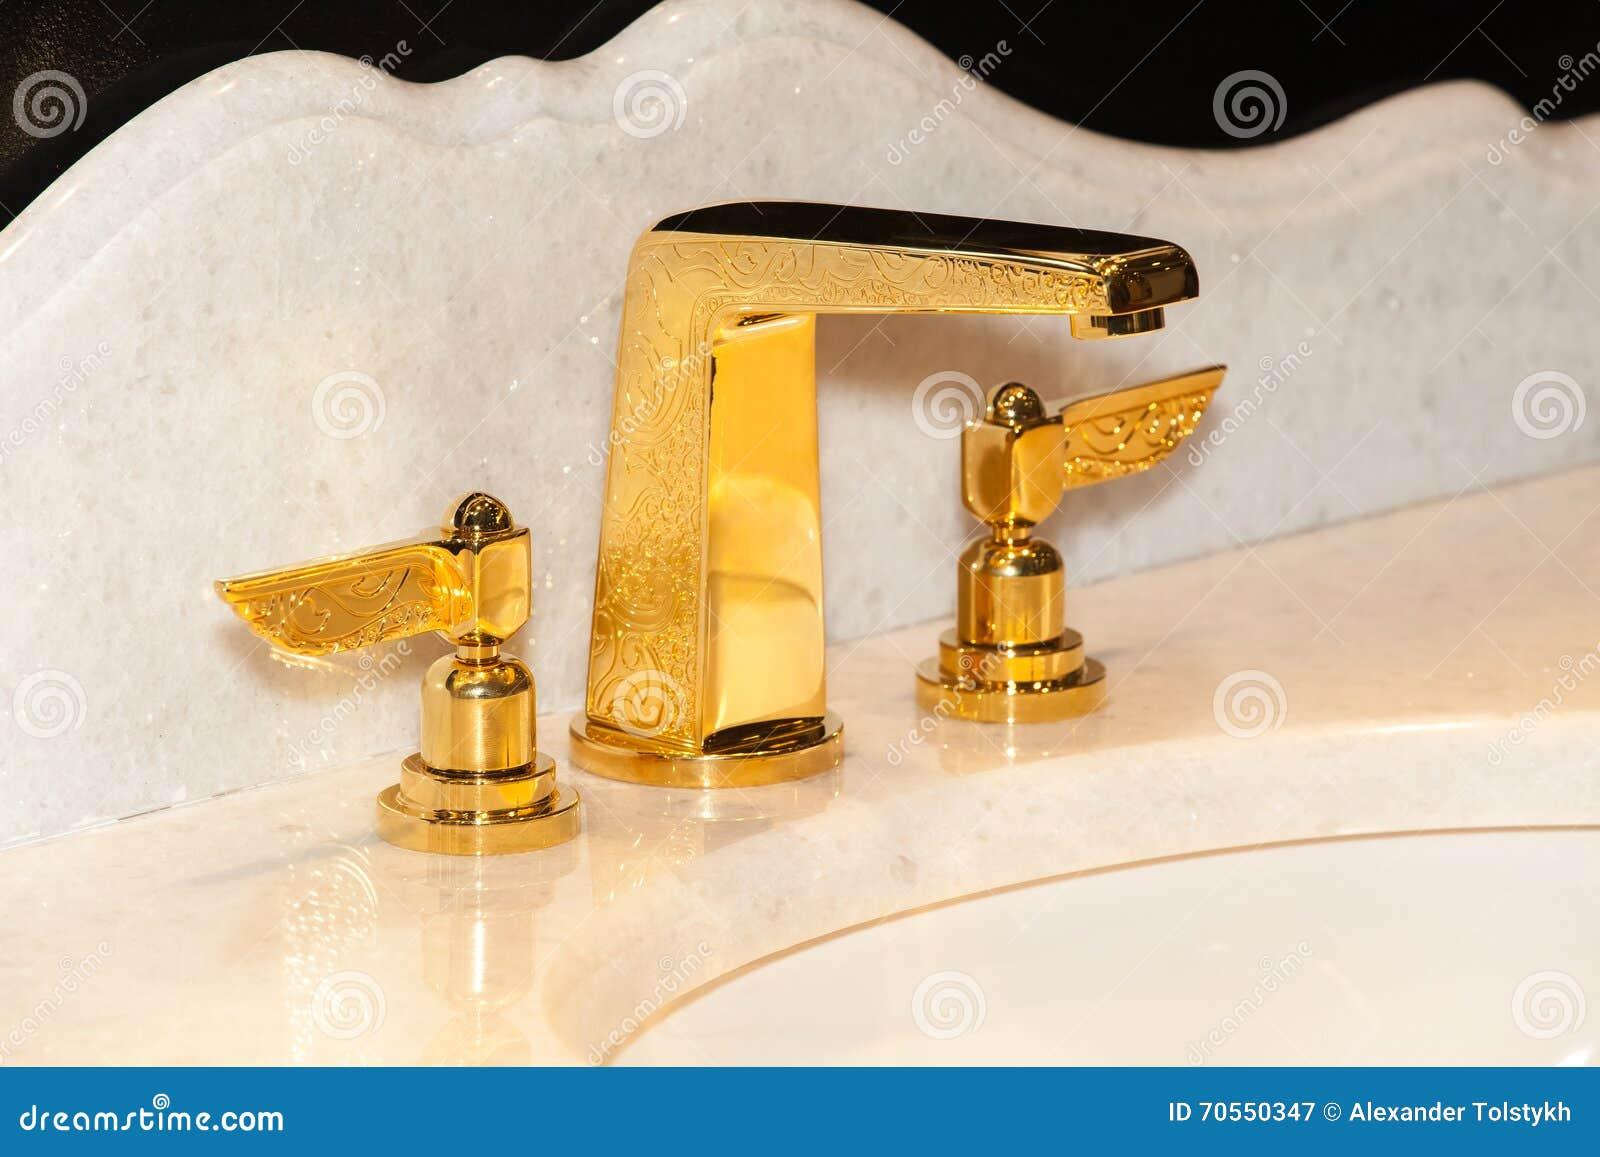 Guld  vattenkran i badrum arkivfoto   bild: 70550347